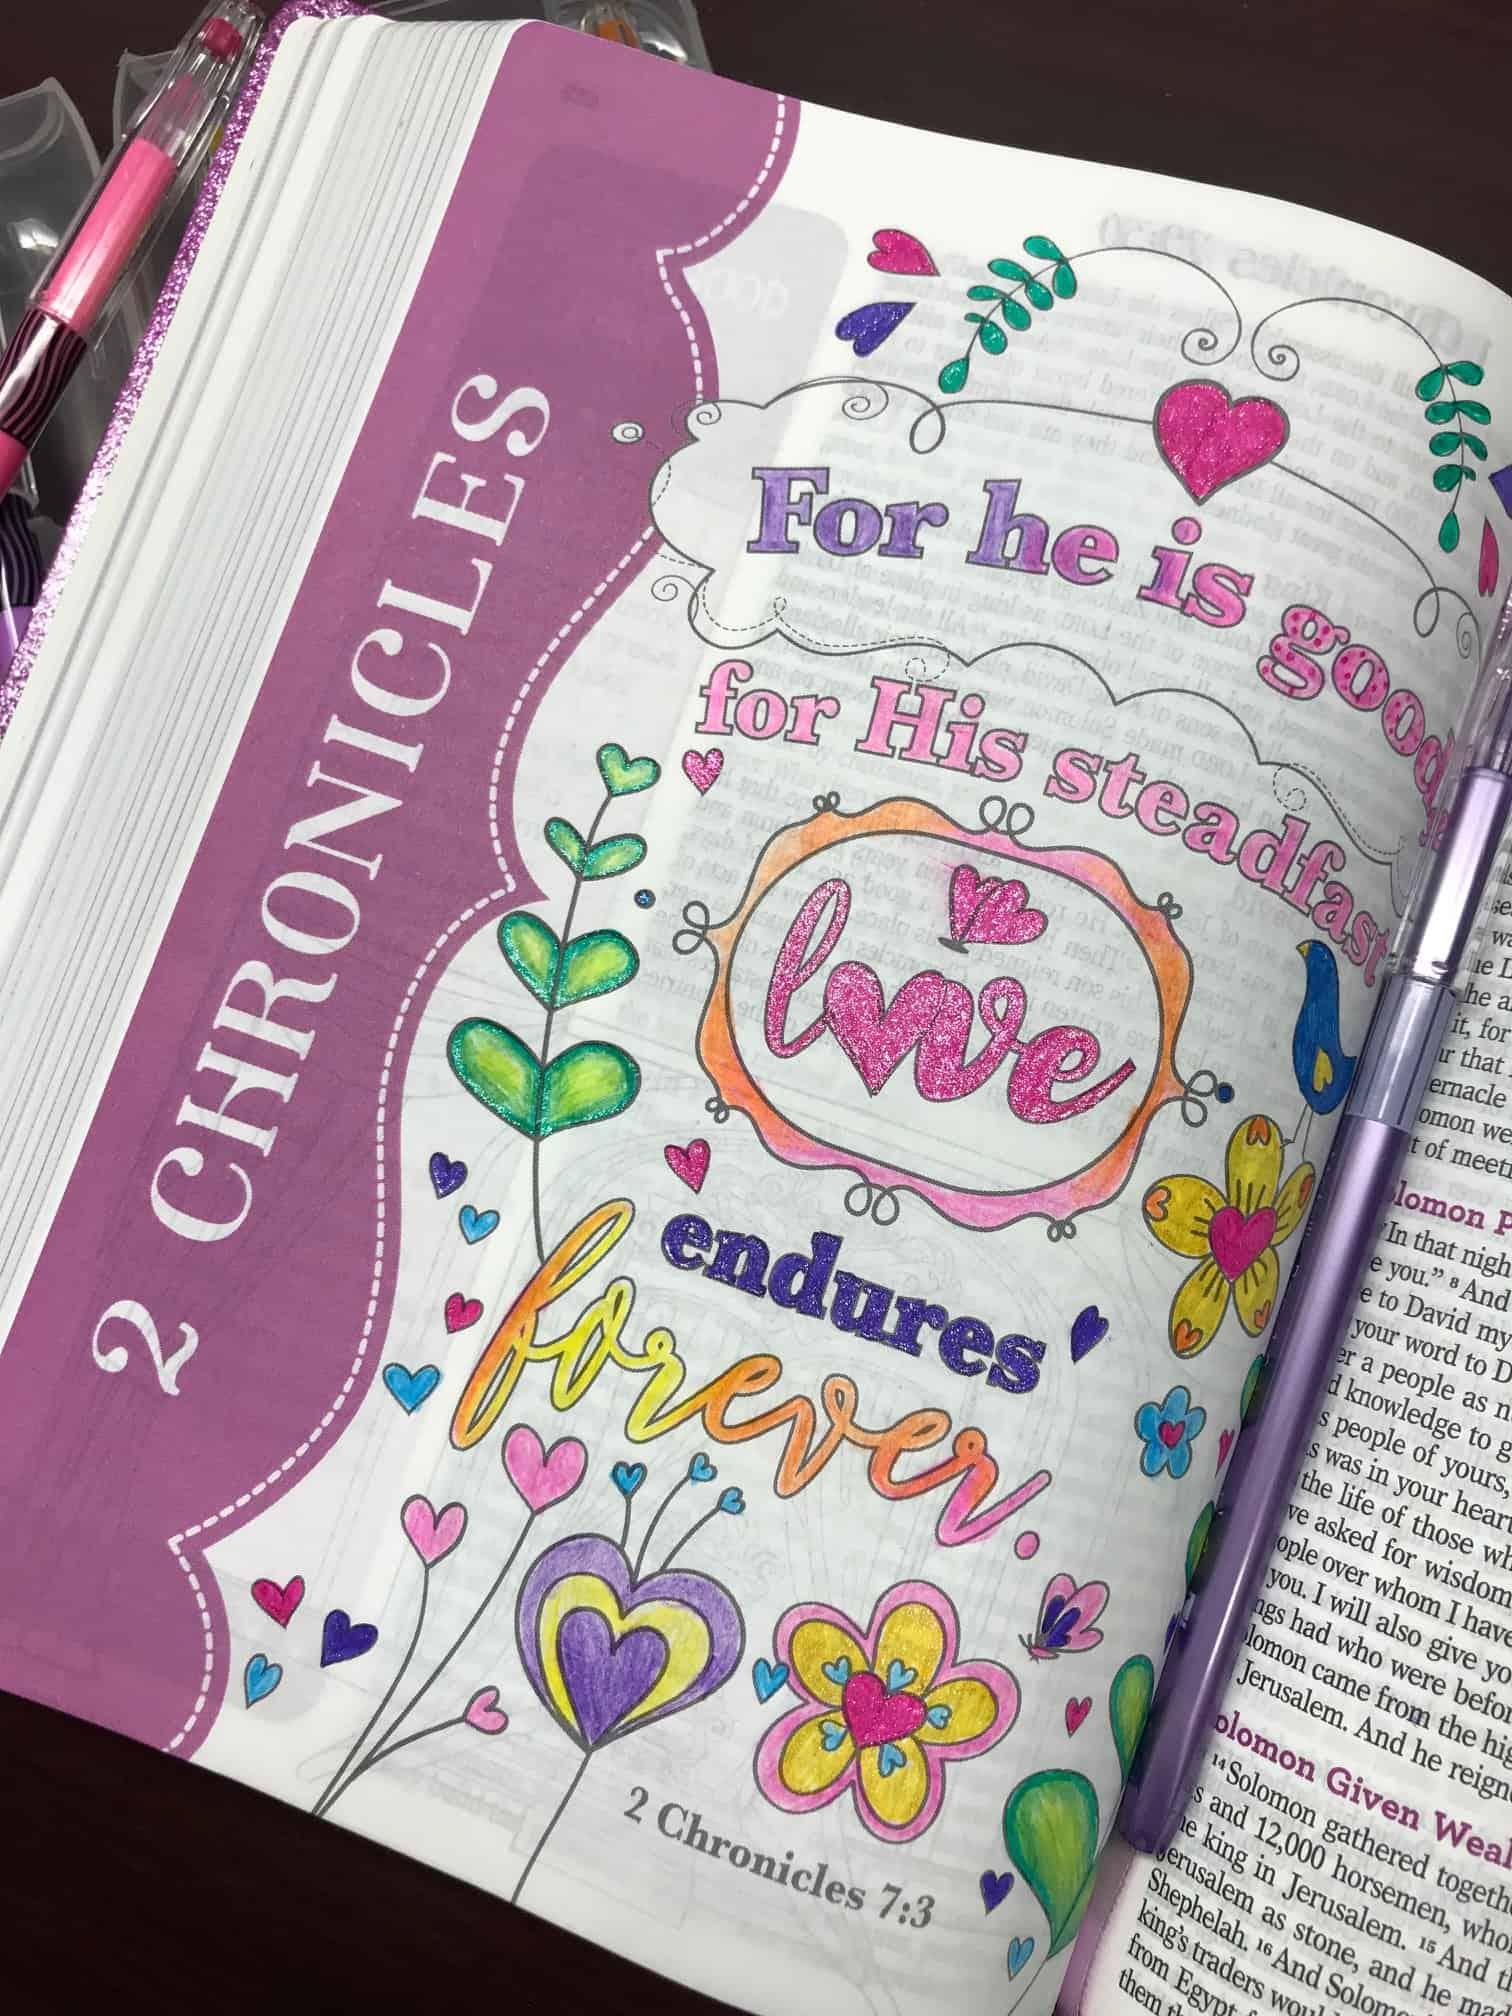 2 Chronicles 7:3